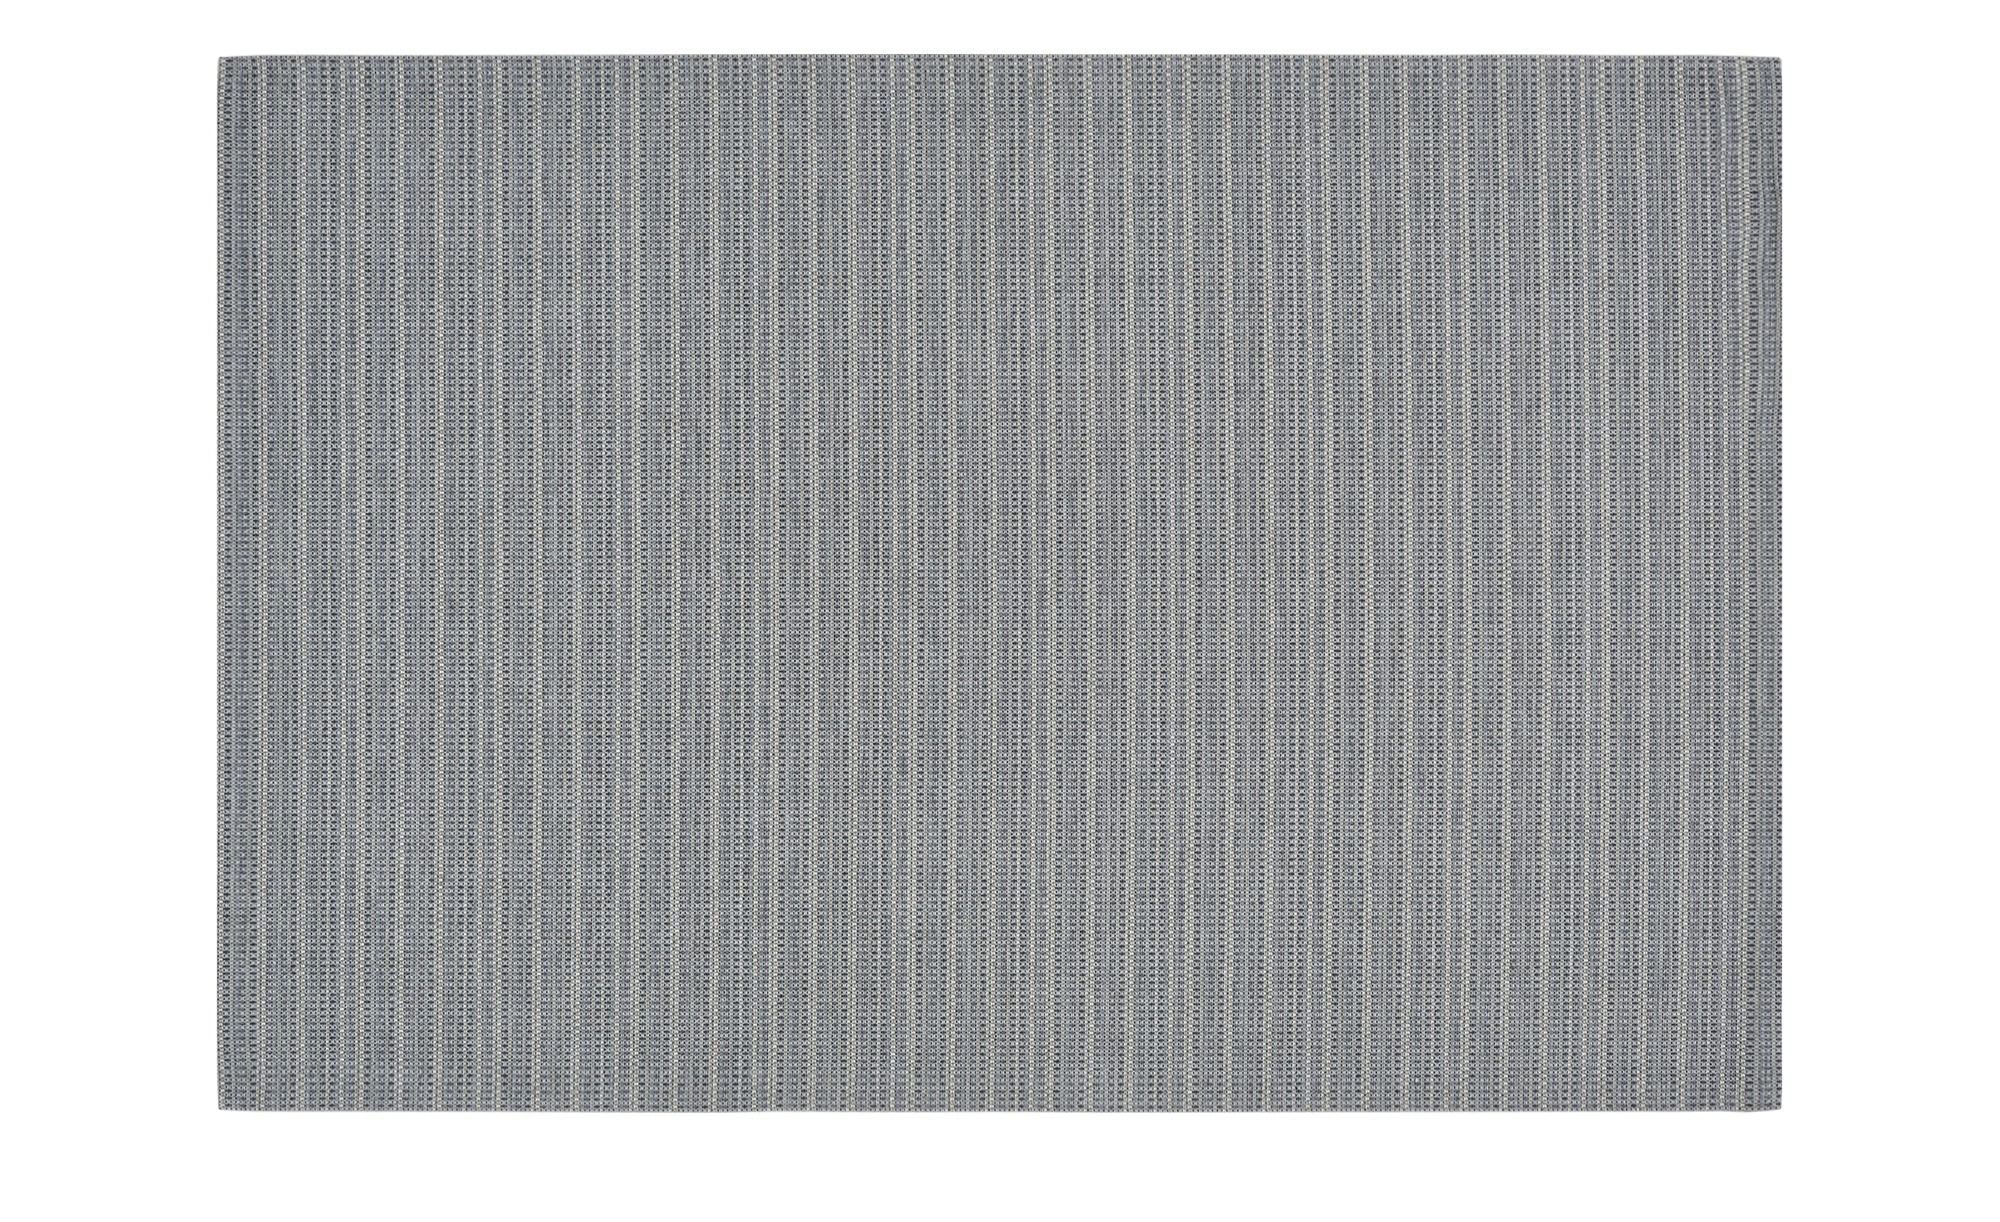 Teppich Berber Sisal Teppich 200x300 Gunstig Casa Berber